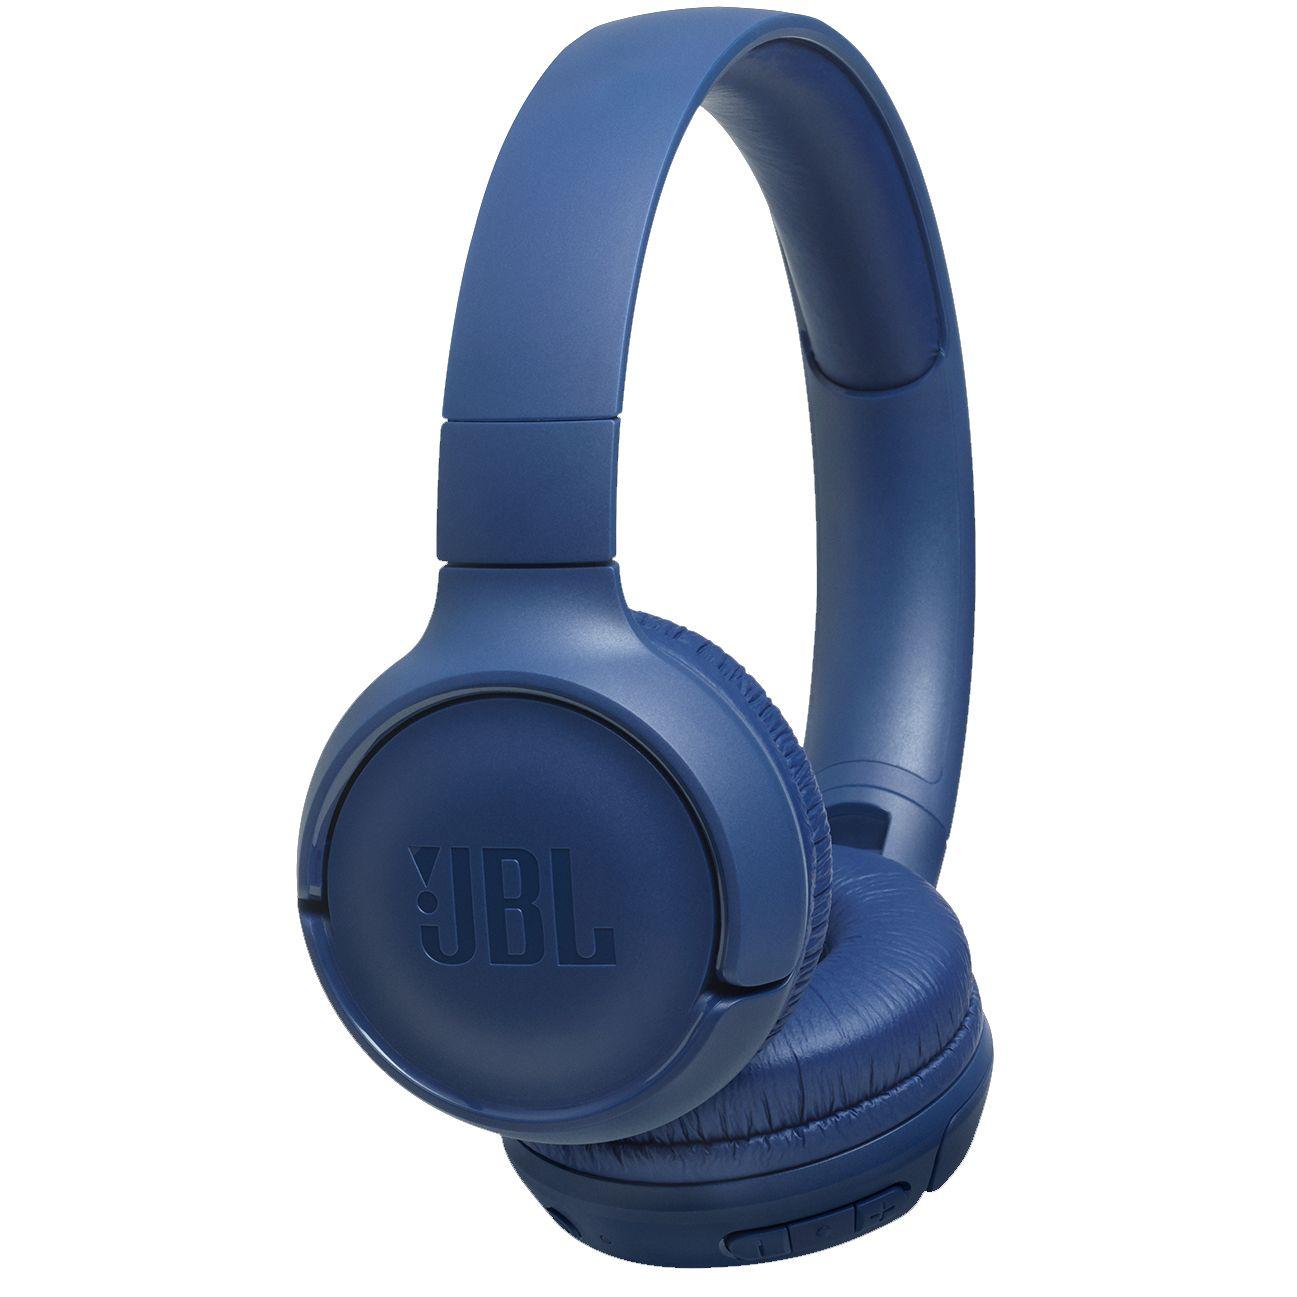 Casti audio On-Ear JBL Tune 500BT, Wireless, Bluetooth, Pure Bass Sound, Hands-free Call, 16H, Blue